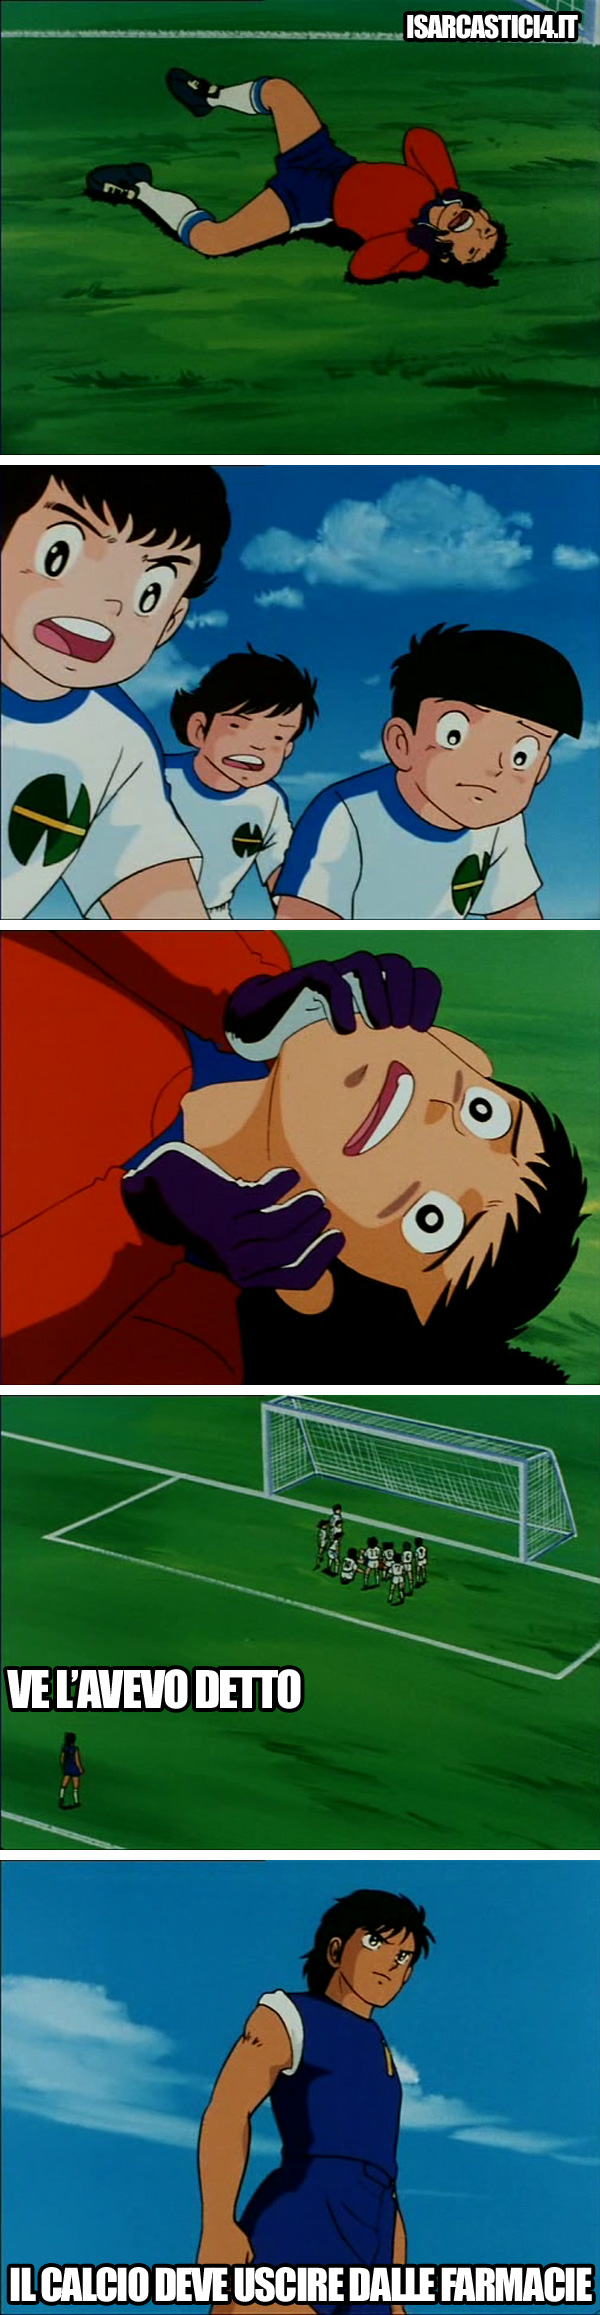 Holly & Benji, Capitan Tsubasa meme ita - Ve l'aveva detto.